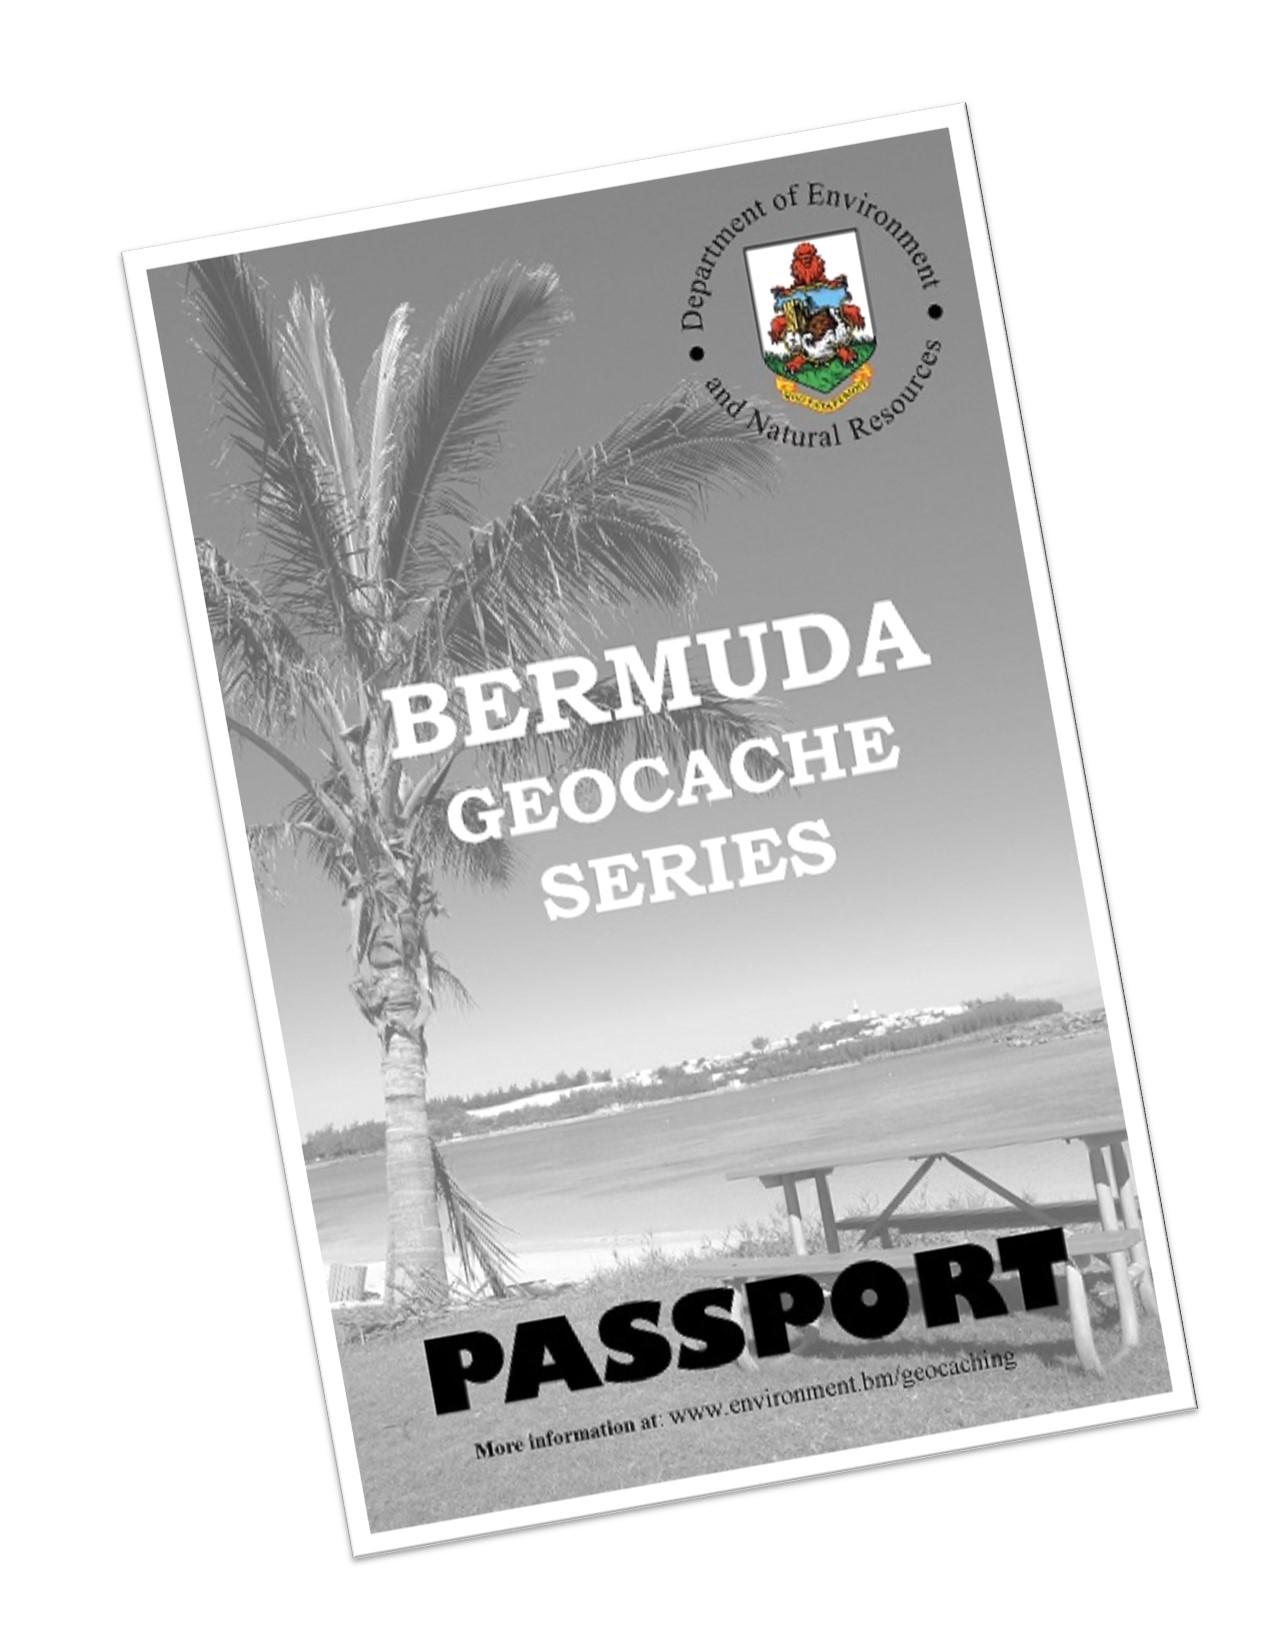 Click to download the Bermuda Geocache Series Passport